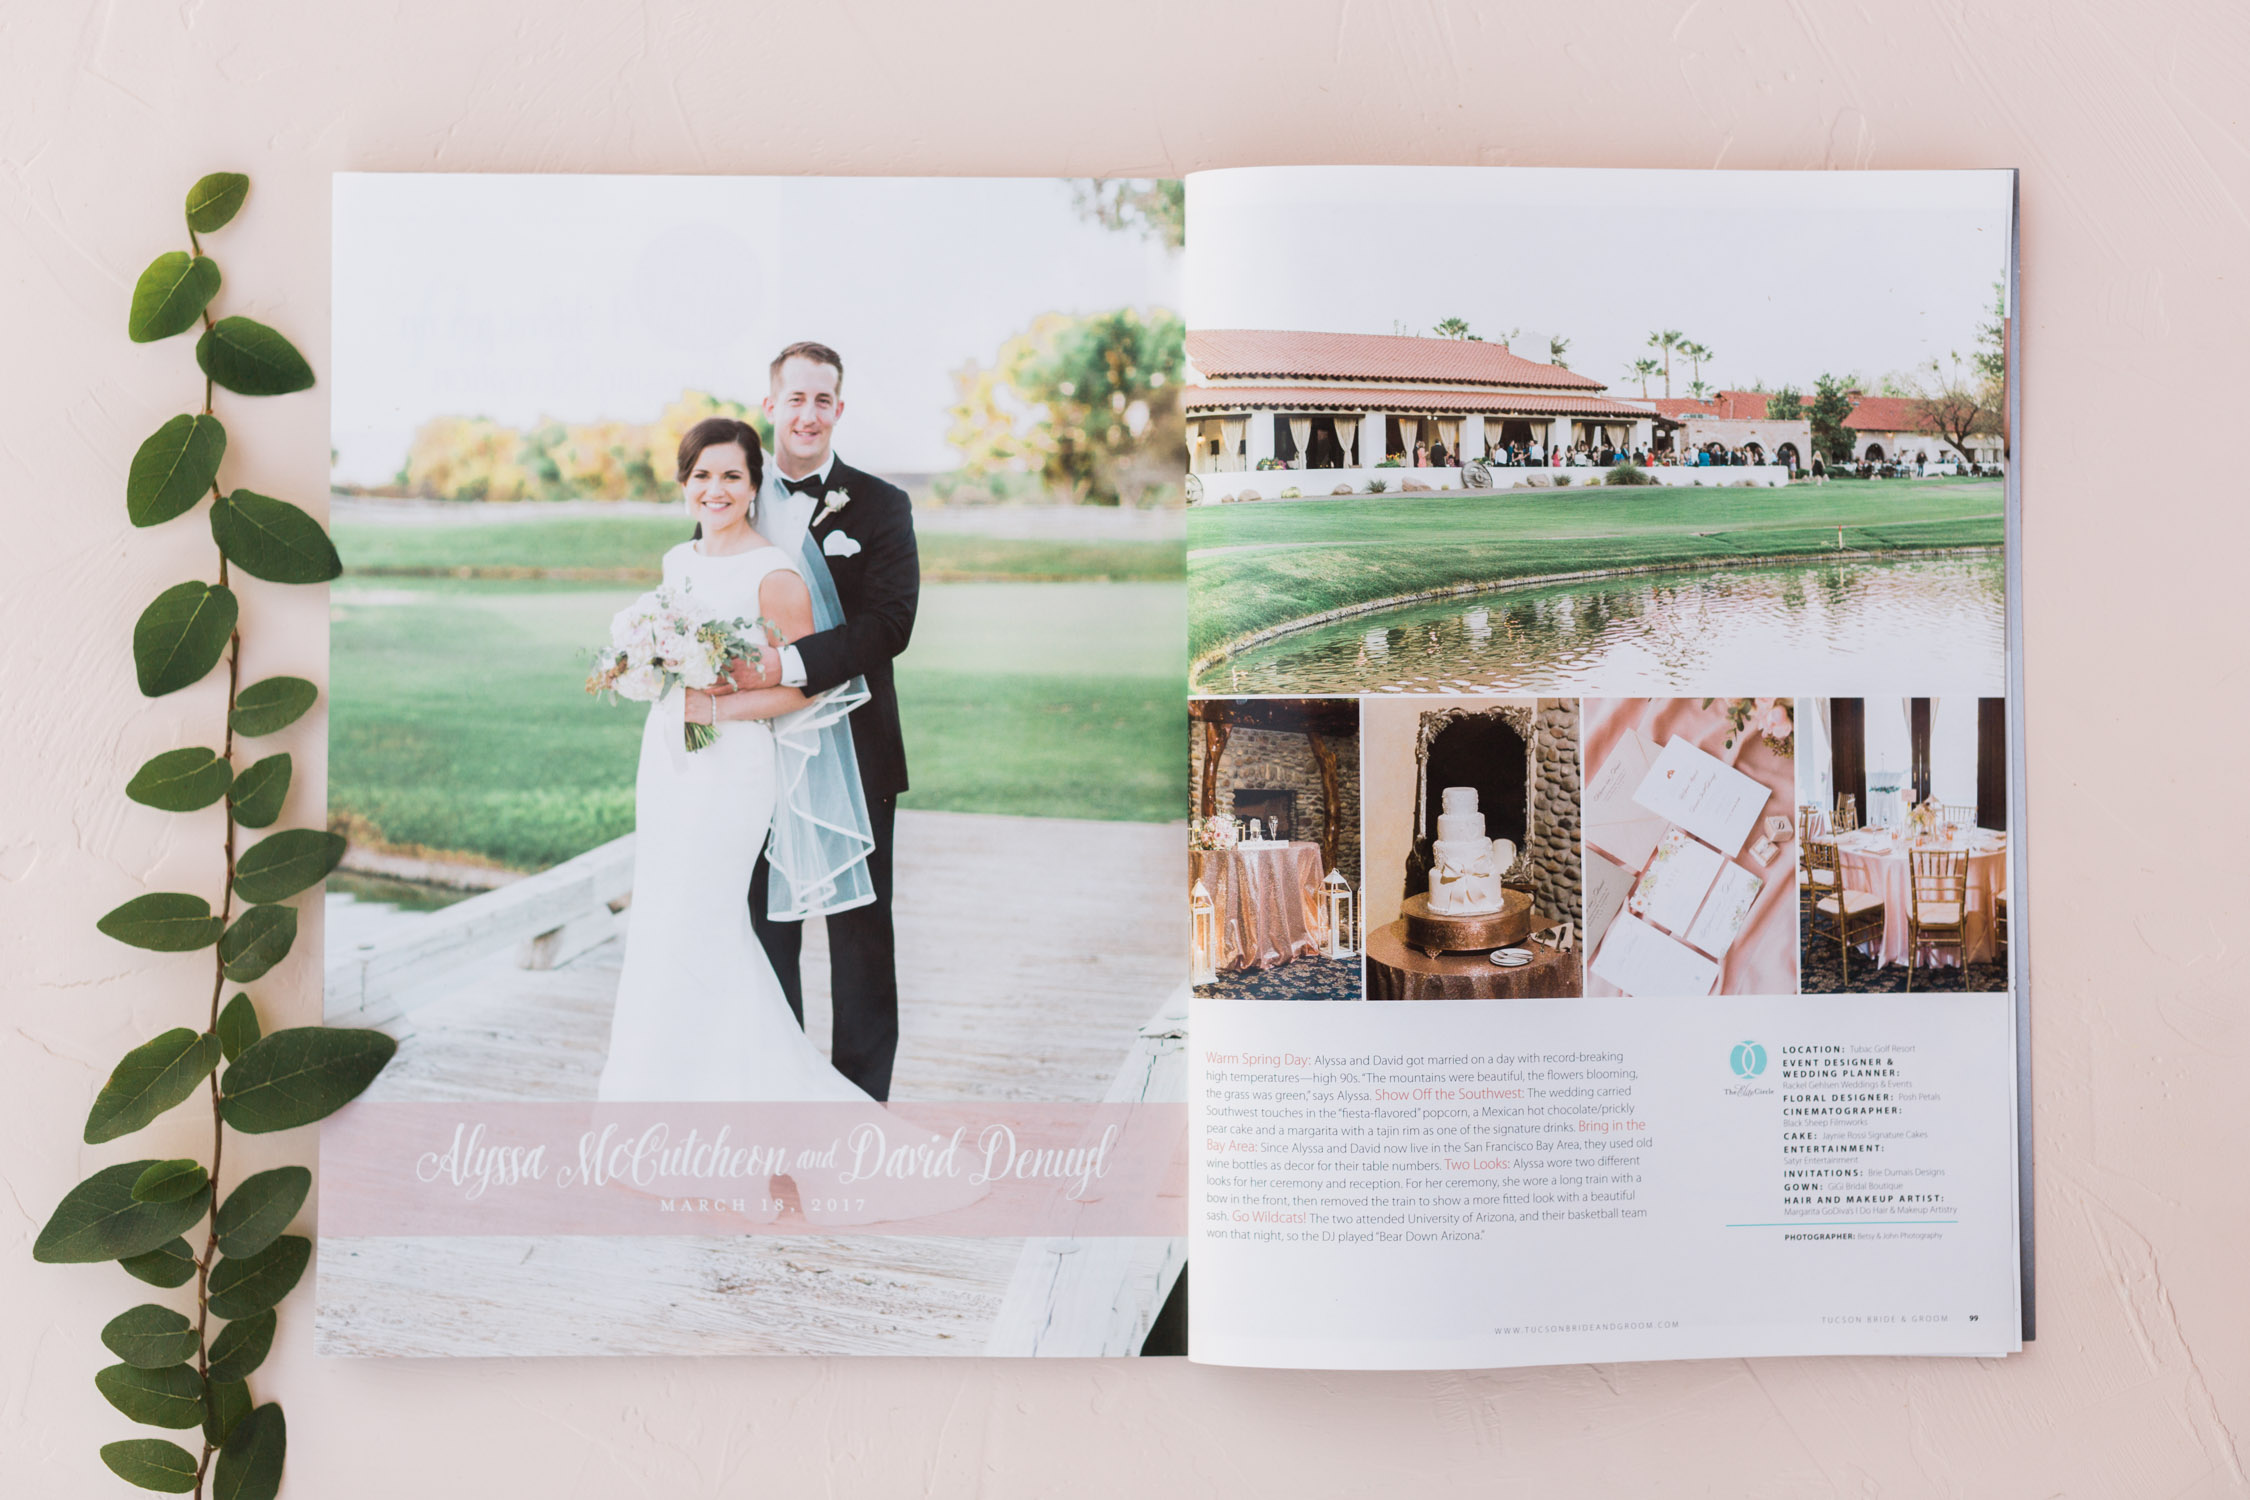 Alyssa & Dave's gorgeous Tubac Golf Resort wedding featured in Tucson Bride & Groom! Captured by Tucson wedding Photographers Betsy & John